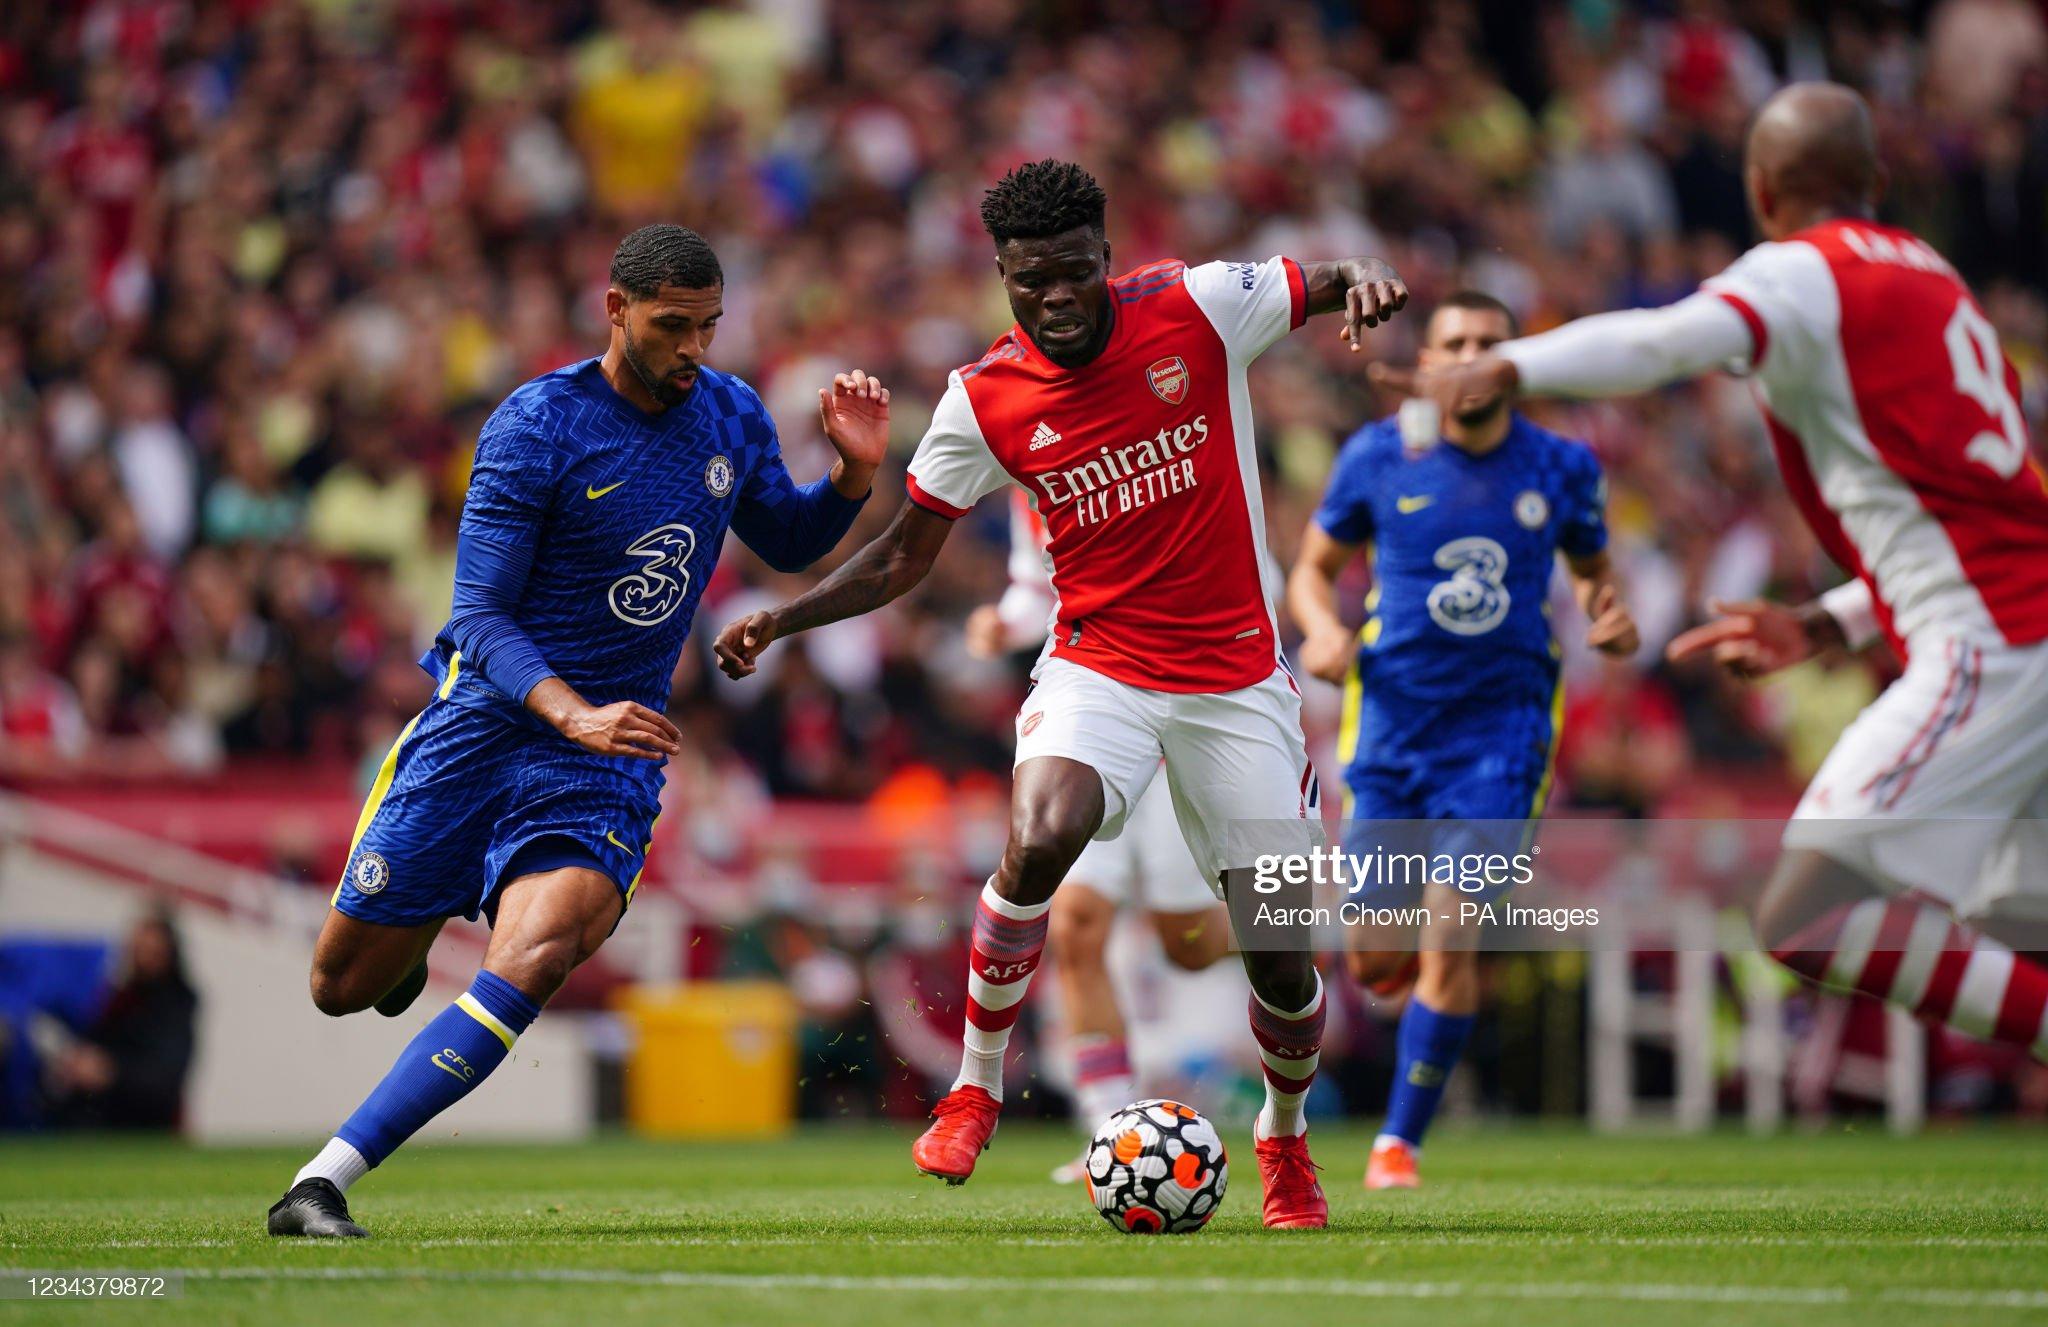 Arsenal v Chelsea - The Mind Series - Emirates Stadium : News Photo